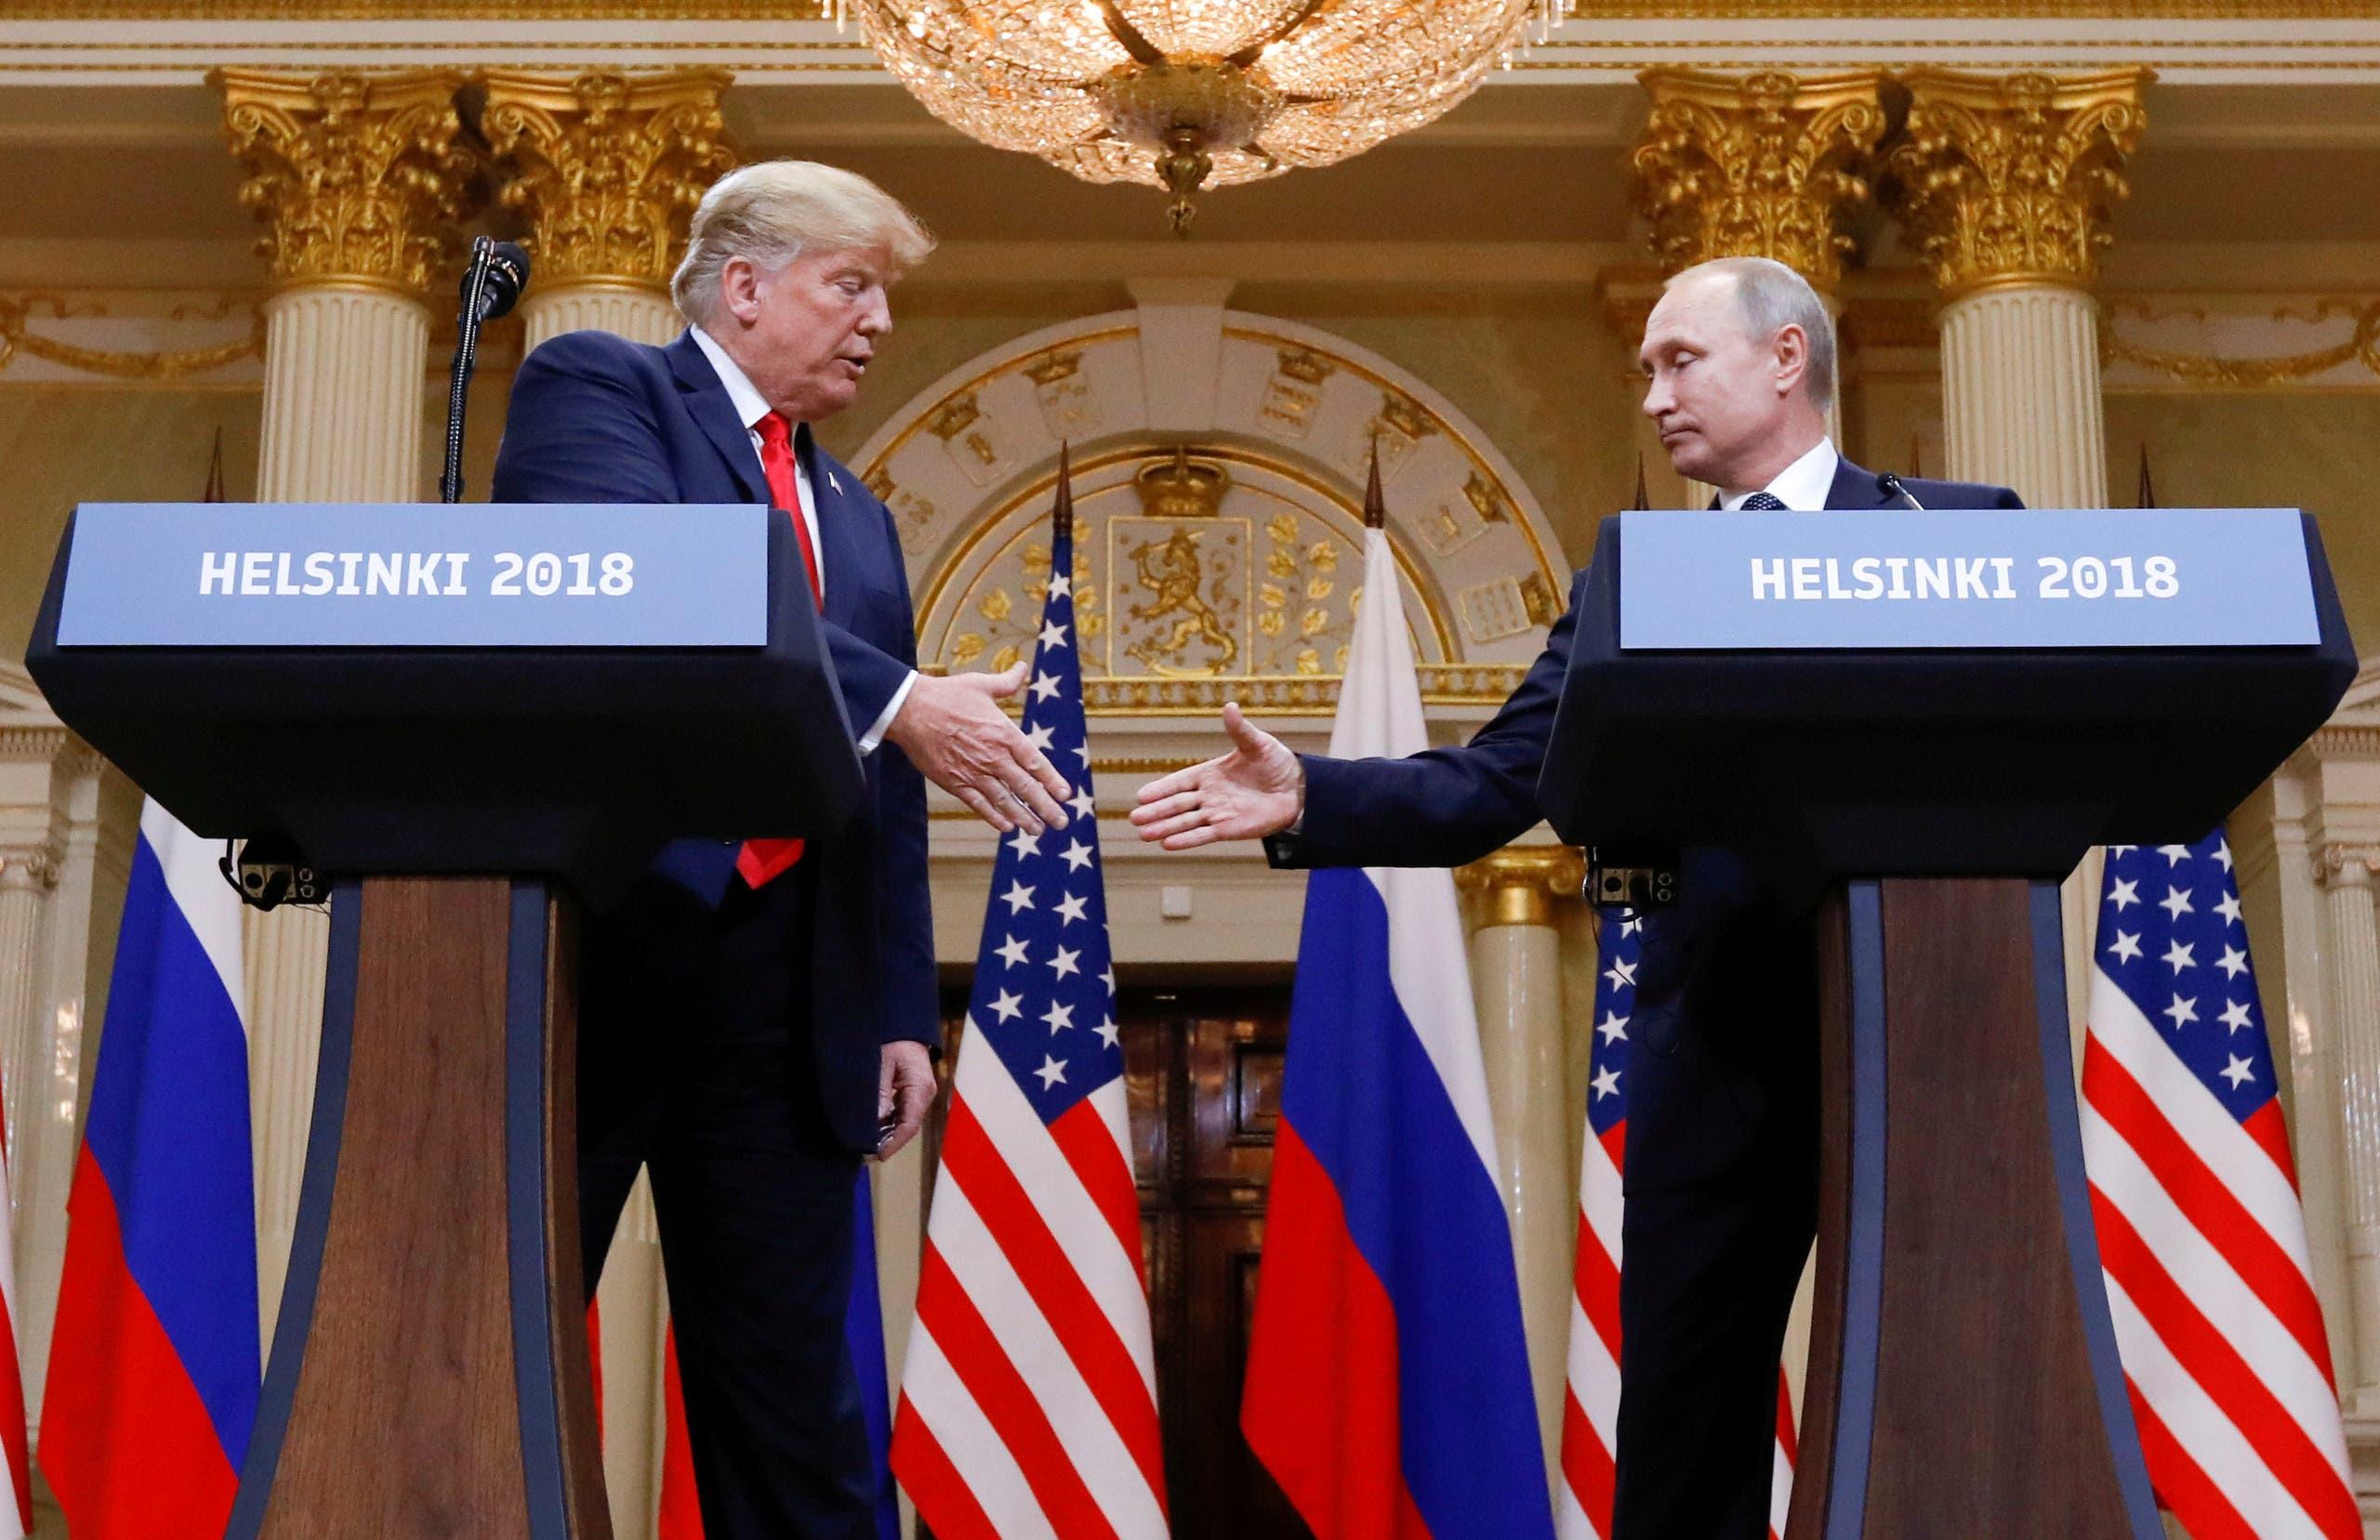 Meeting 2018 in Helsinki between Trump and Putin